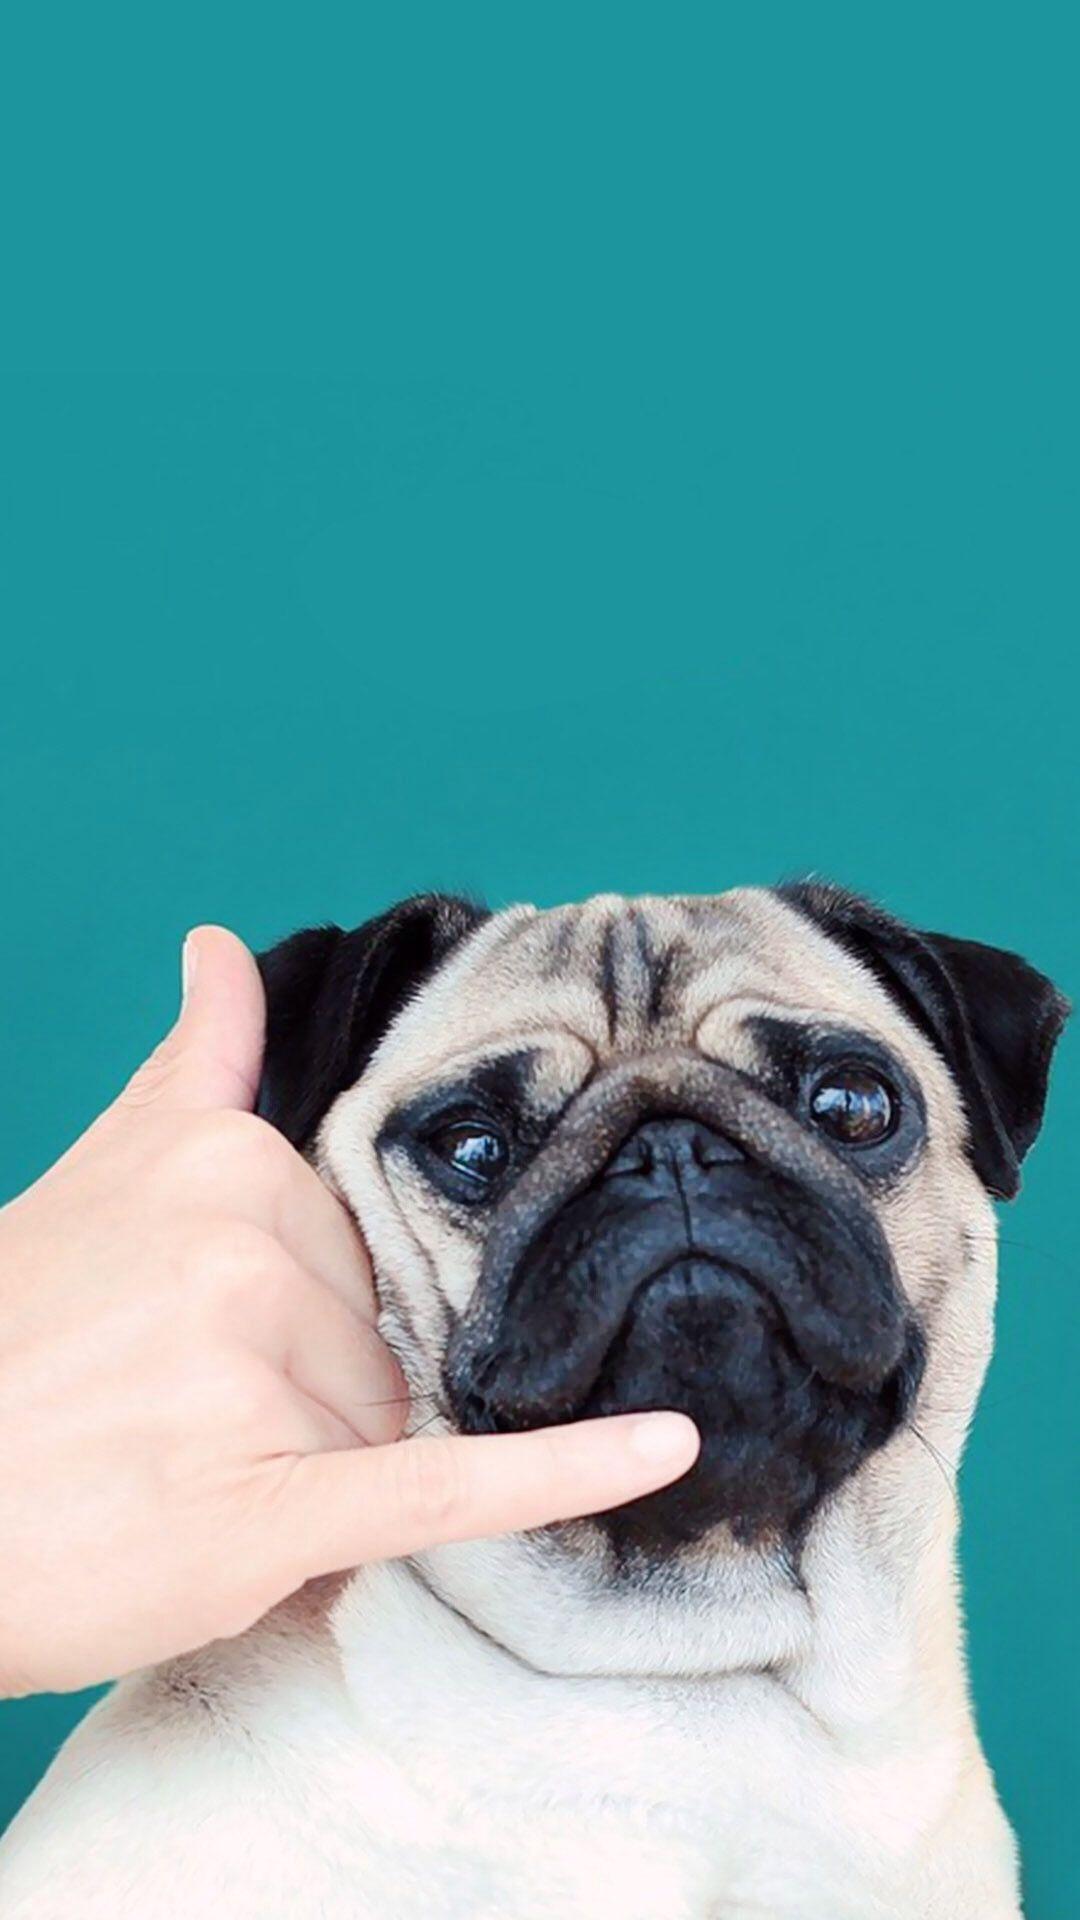 Pin by lavanya kathuria on wallpapers pinterest wallpaper dog